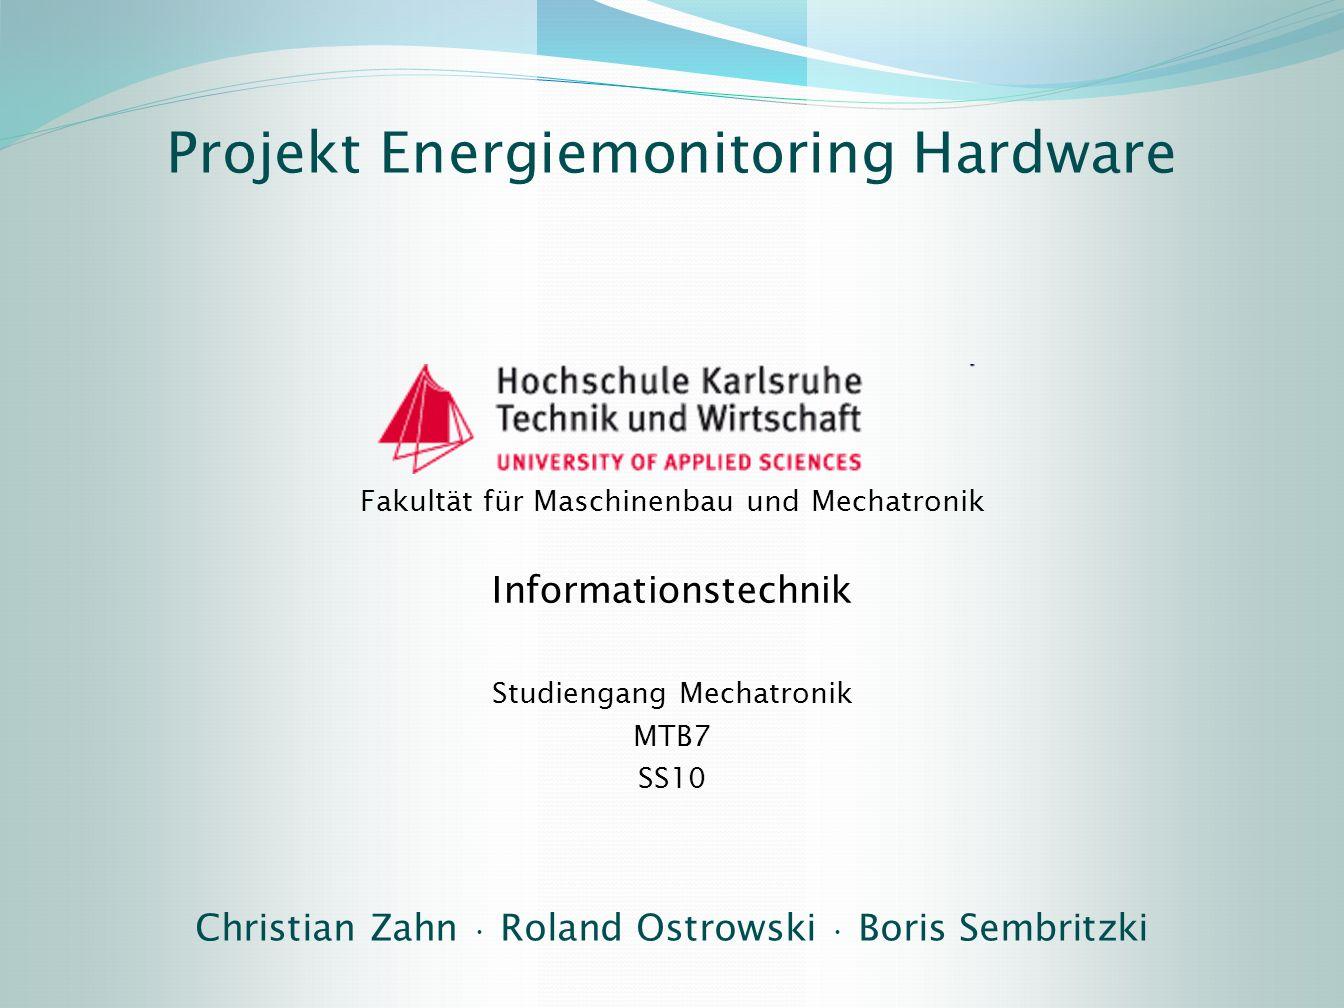 Fakultät für Maschinenbau und Mechatronik Informationstechnik Studiengang Mechatronik MTB7 SS10 Christian Zahn Roland Ostrowski Boris Sembritzki Proje